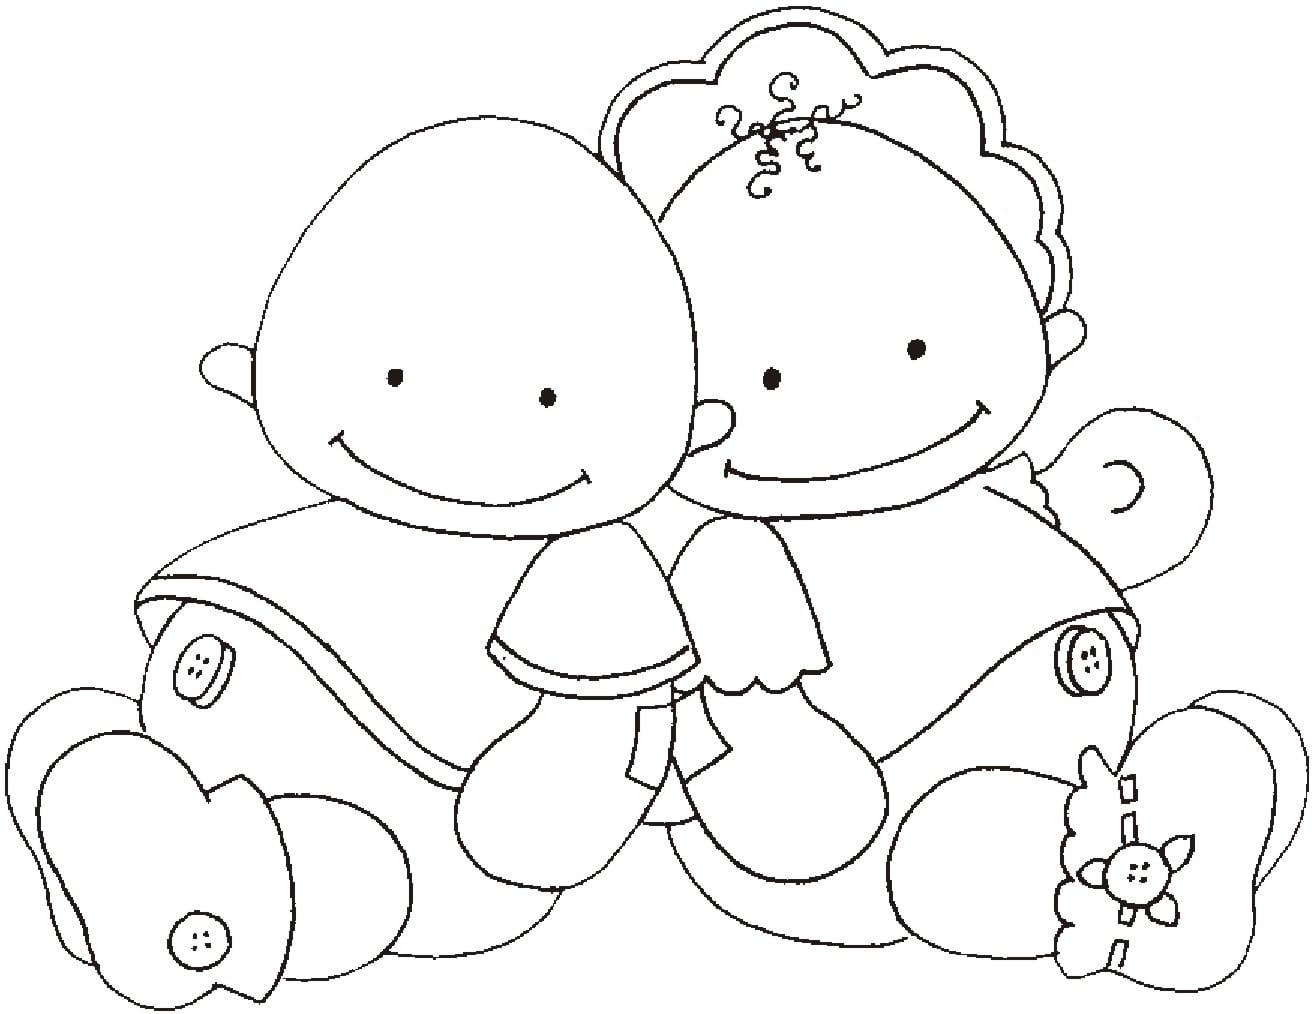 Desenhos De Beb S Para Colorir – Pampekids Net